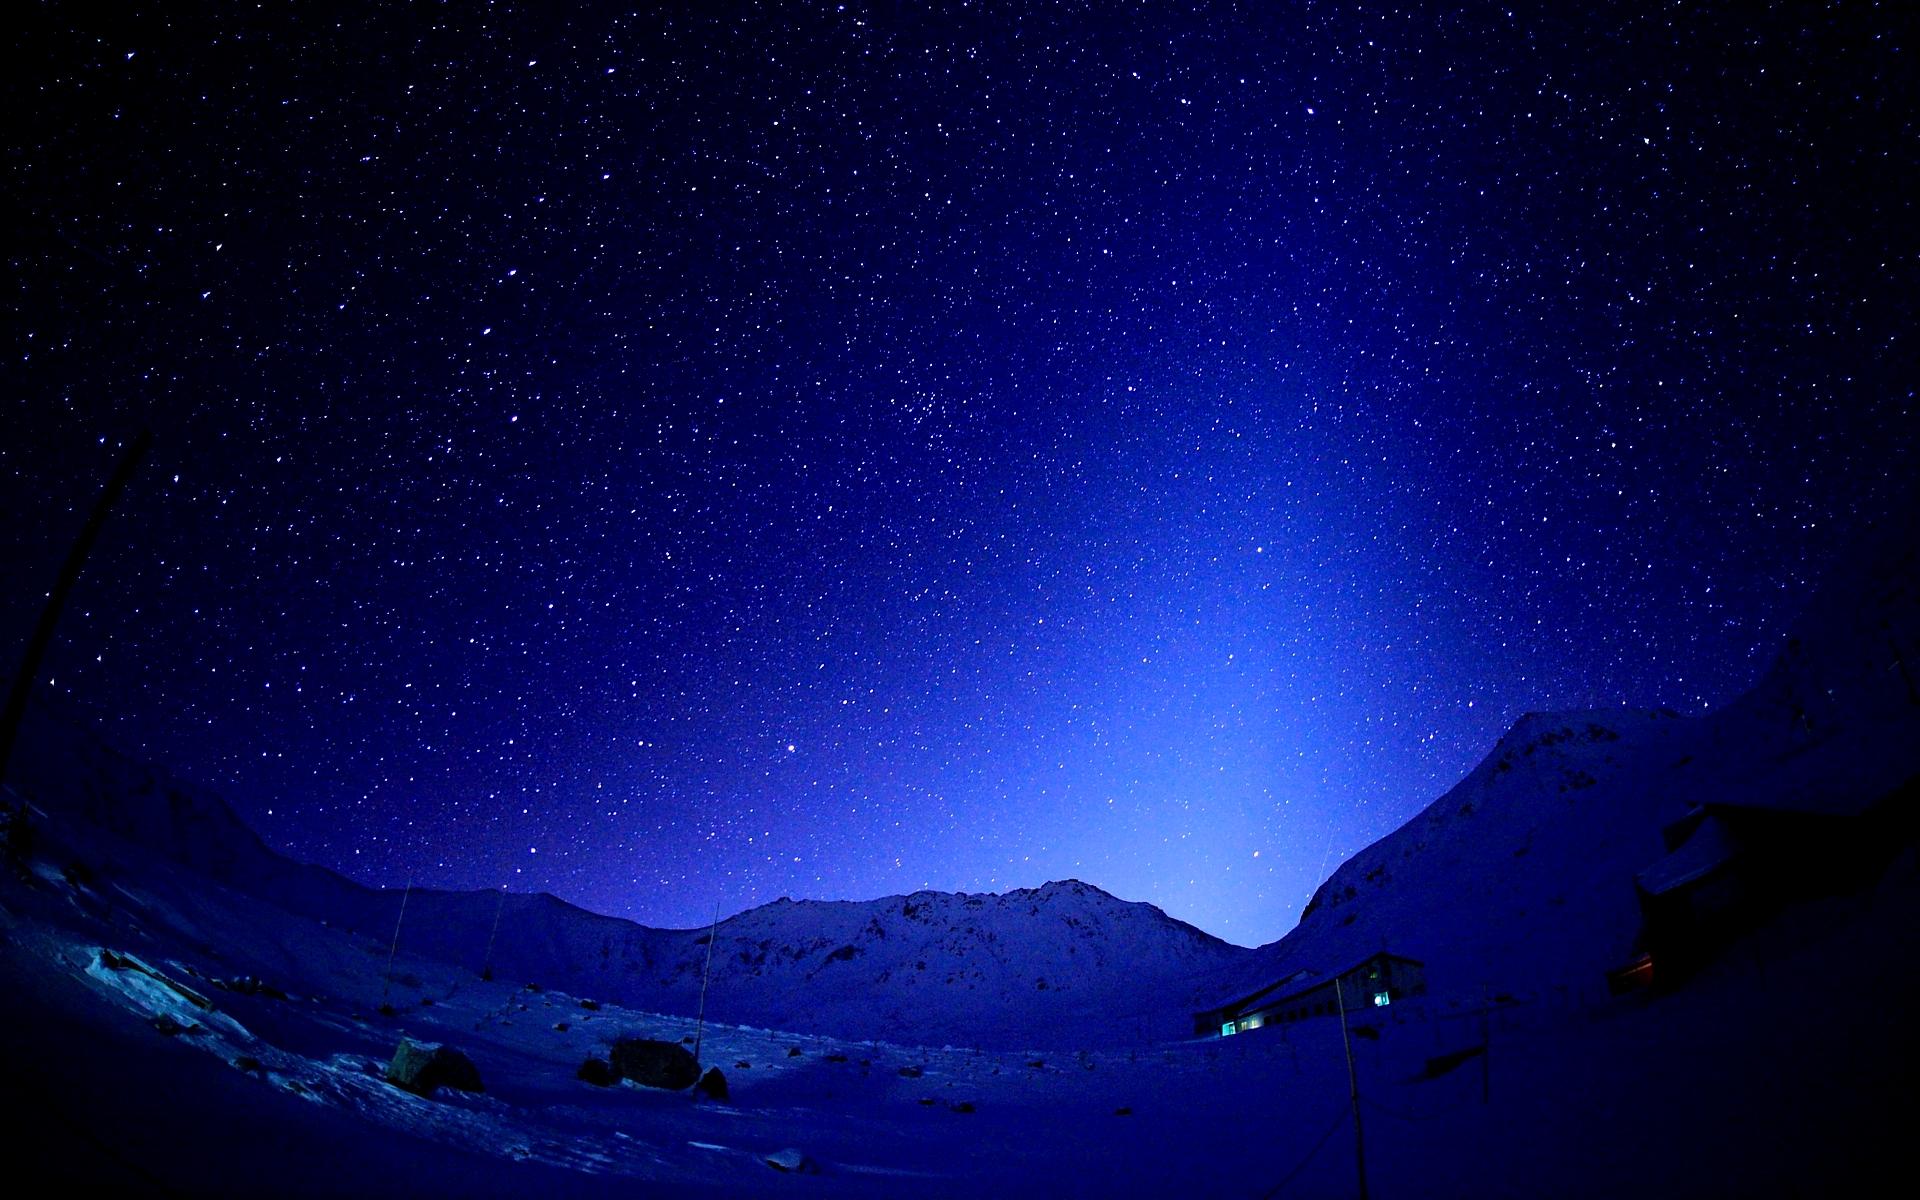 starry sky wallpaper 27482